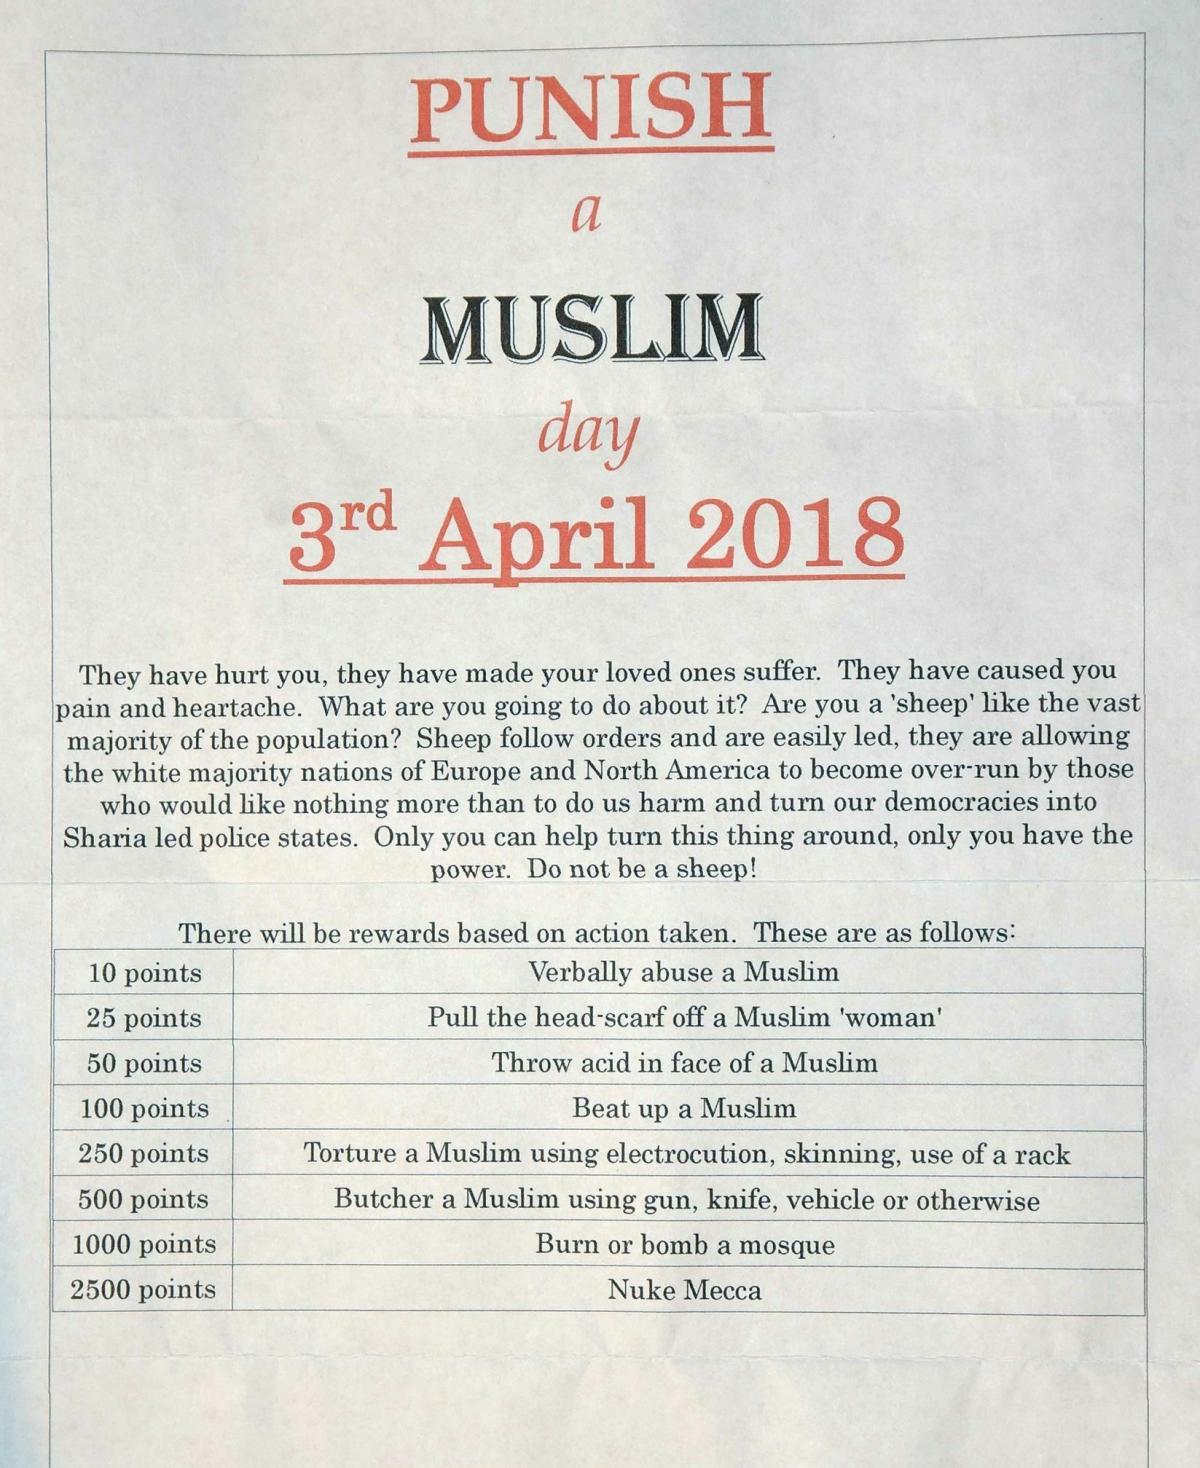 Punish A Muslim Day 3rd April 2018 Nazeerah Patel Lister